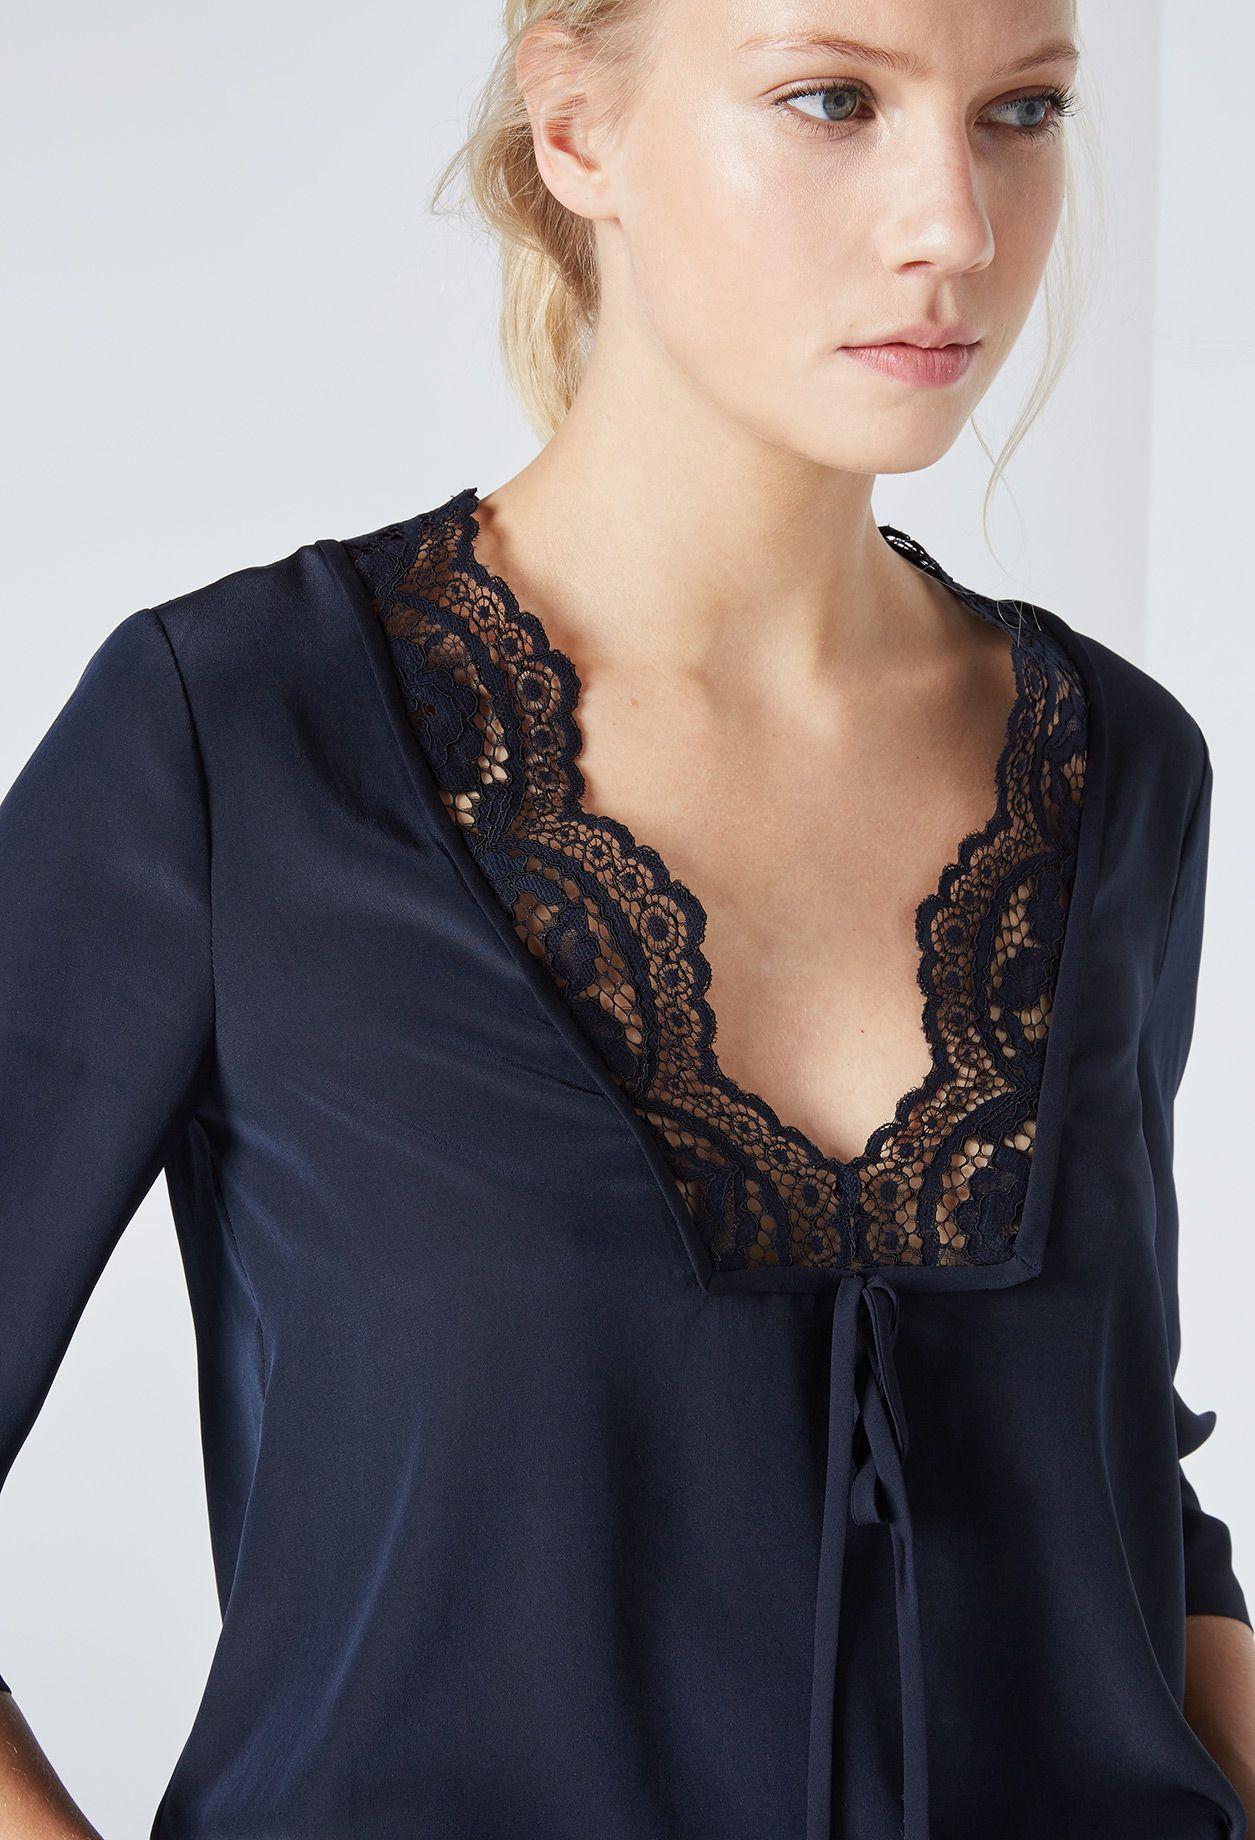 Top BALLROOM   fashion   Pinterest   Chemisier, Mode and Vetements 3dba728b3925